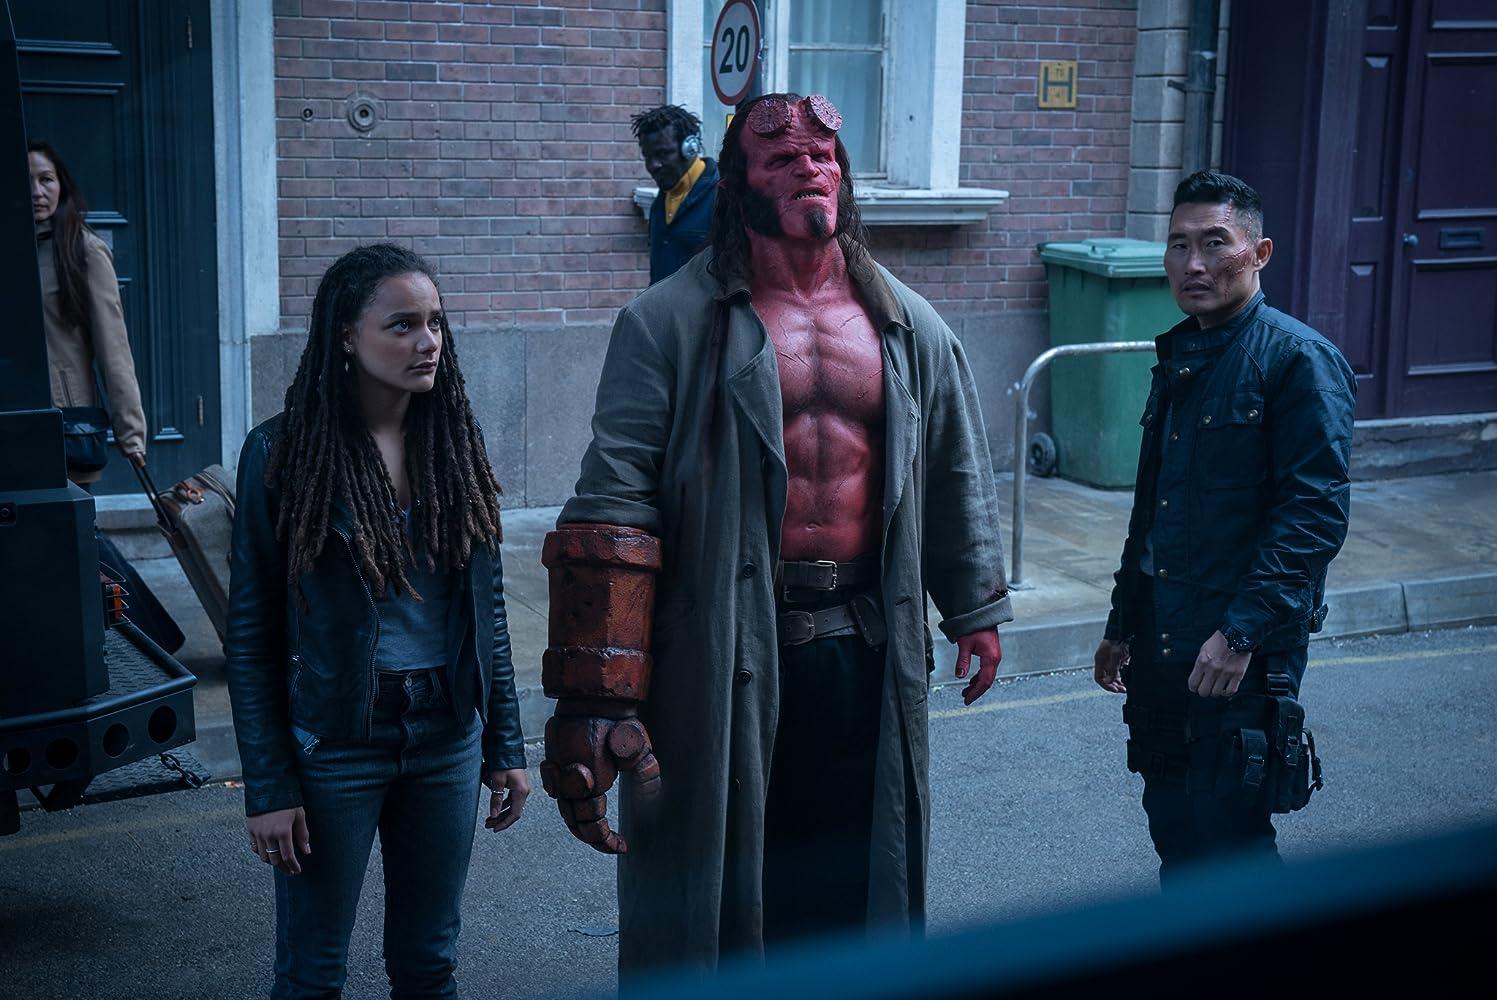 Daniel Dae Kim, David Harbour, and Sasha Lane / Hellboy / Summit Entertainment. © 2019. All rights reserved.